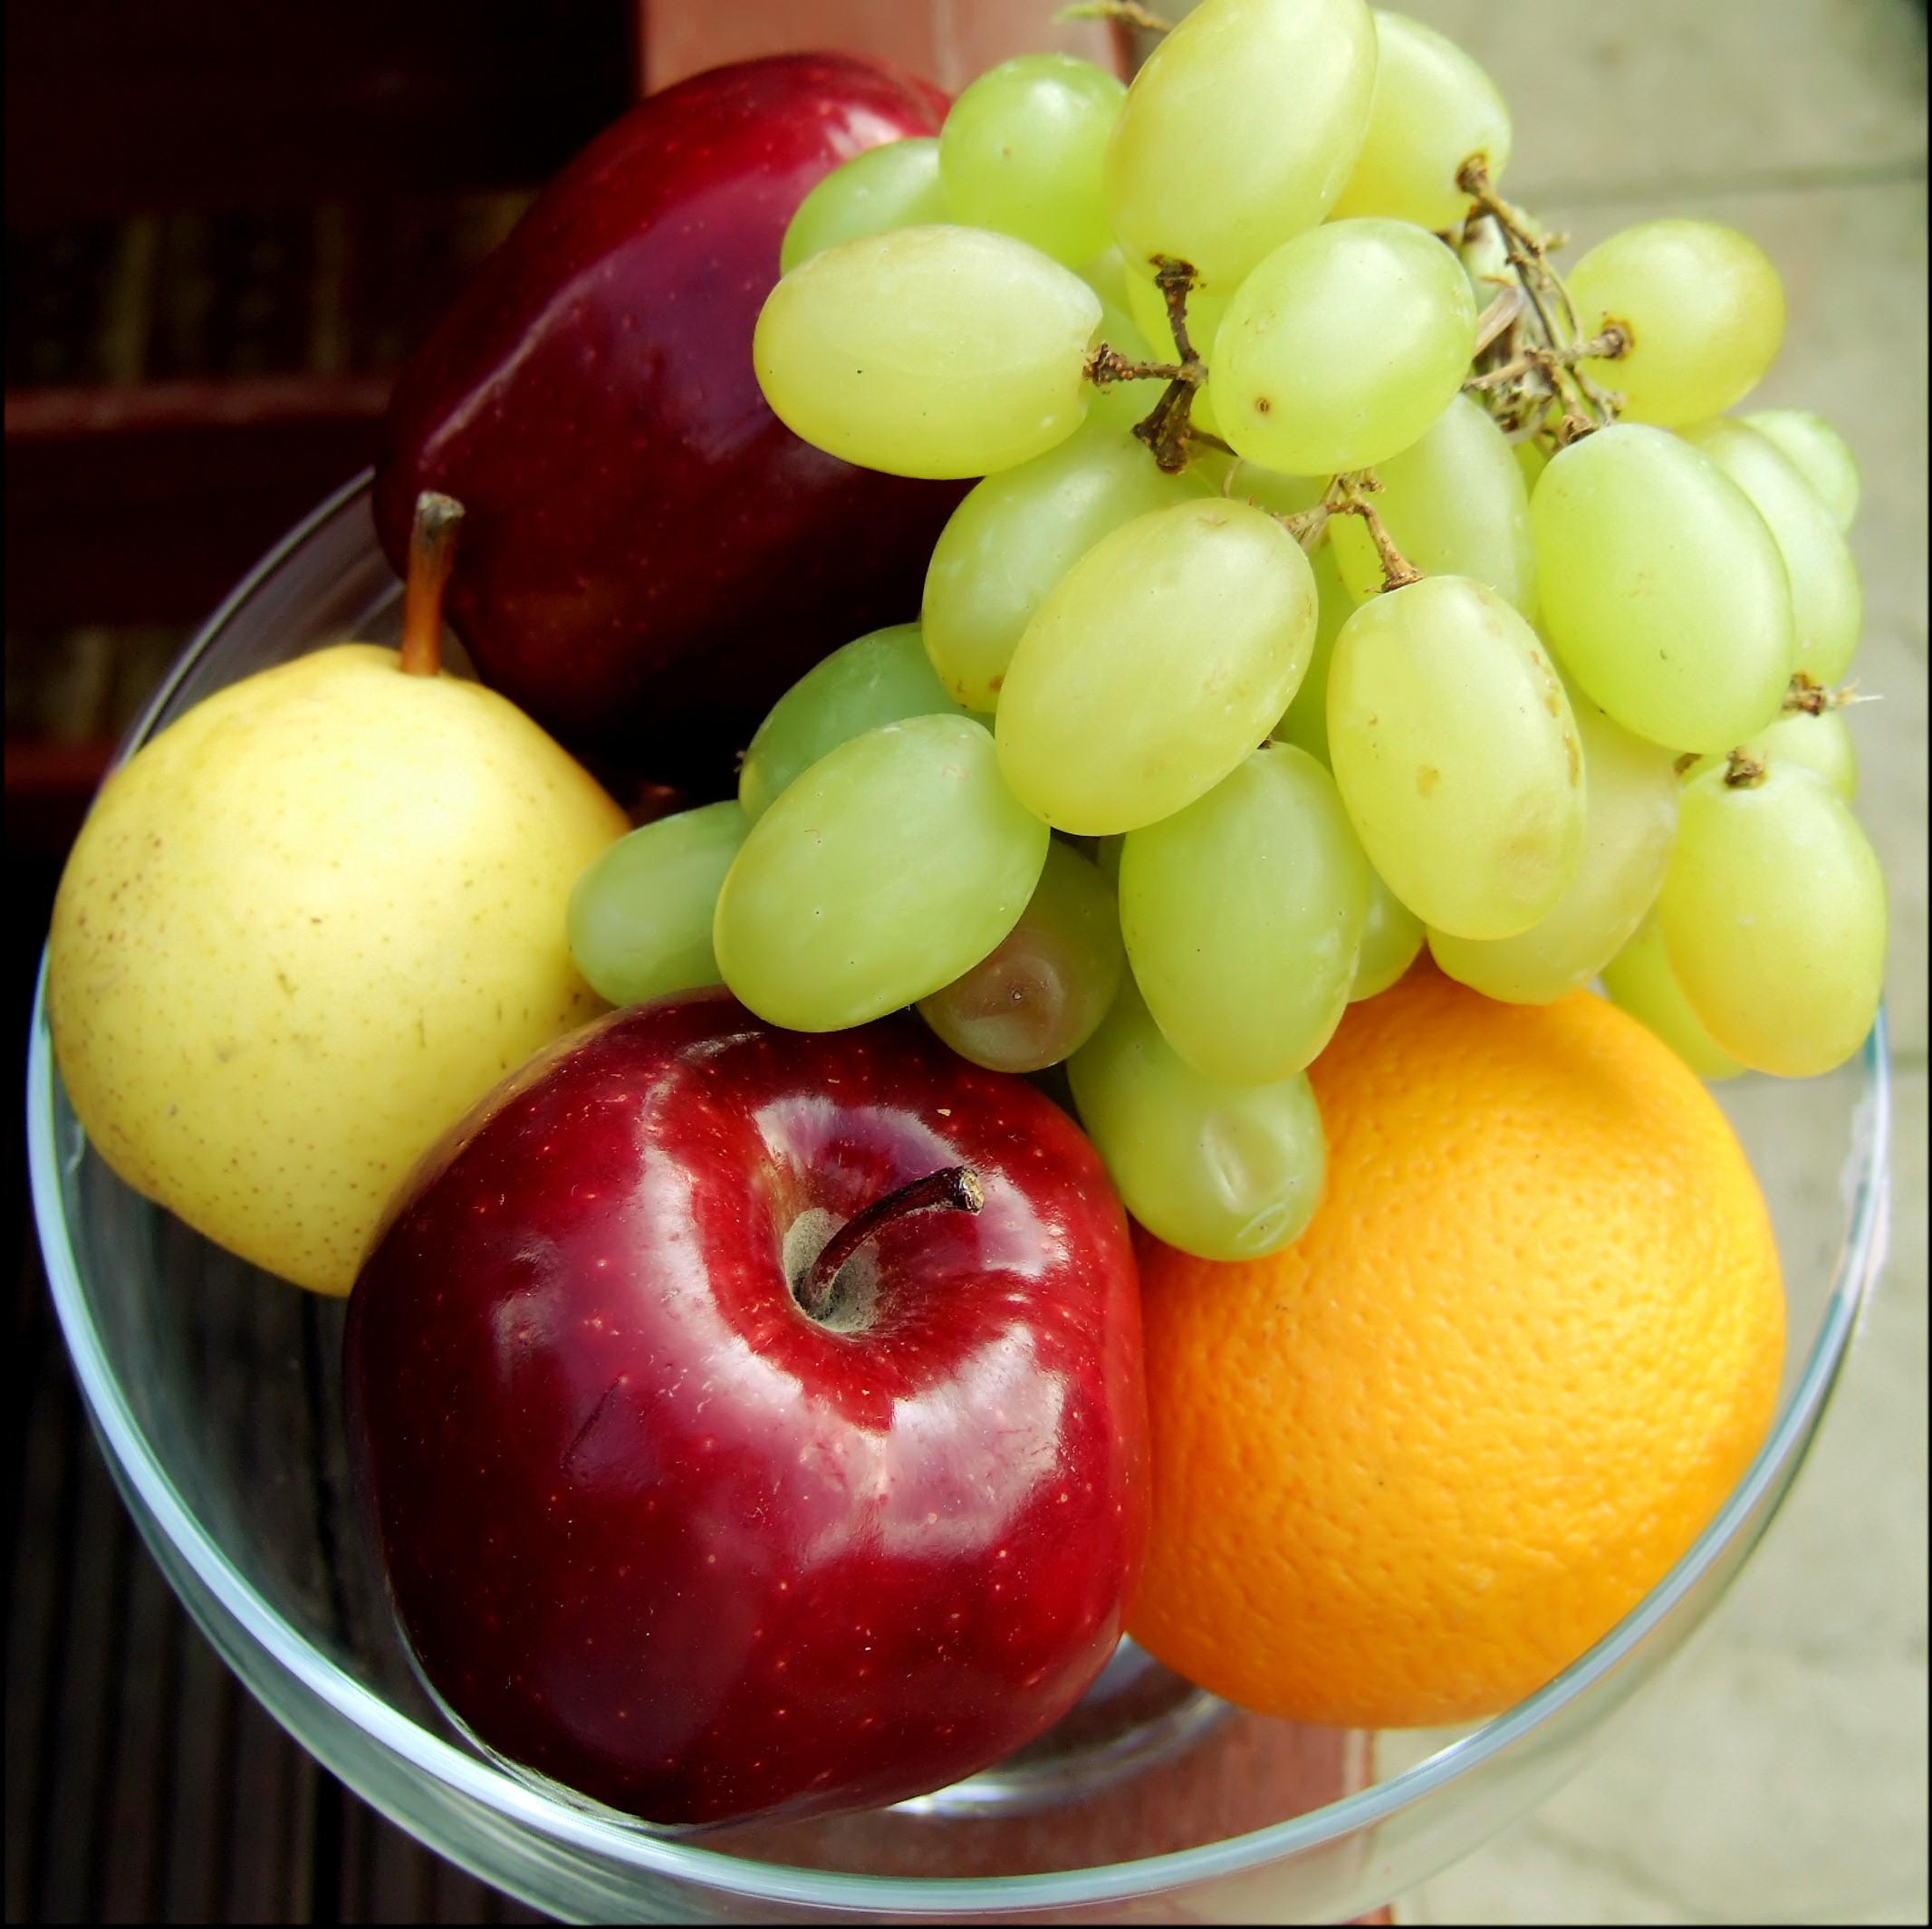 Fruit Basket: Apple, Grapes, Orange, Pear